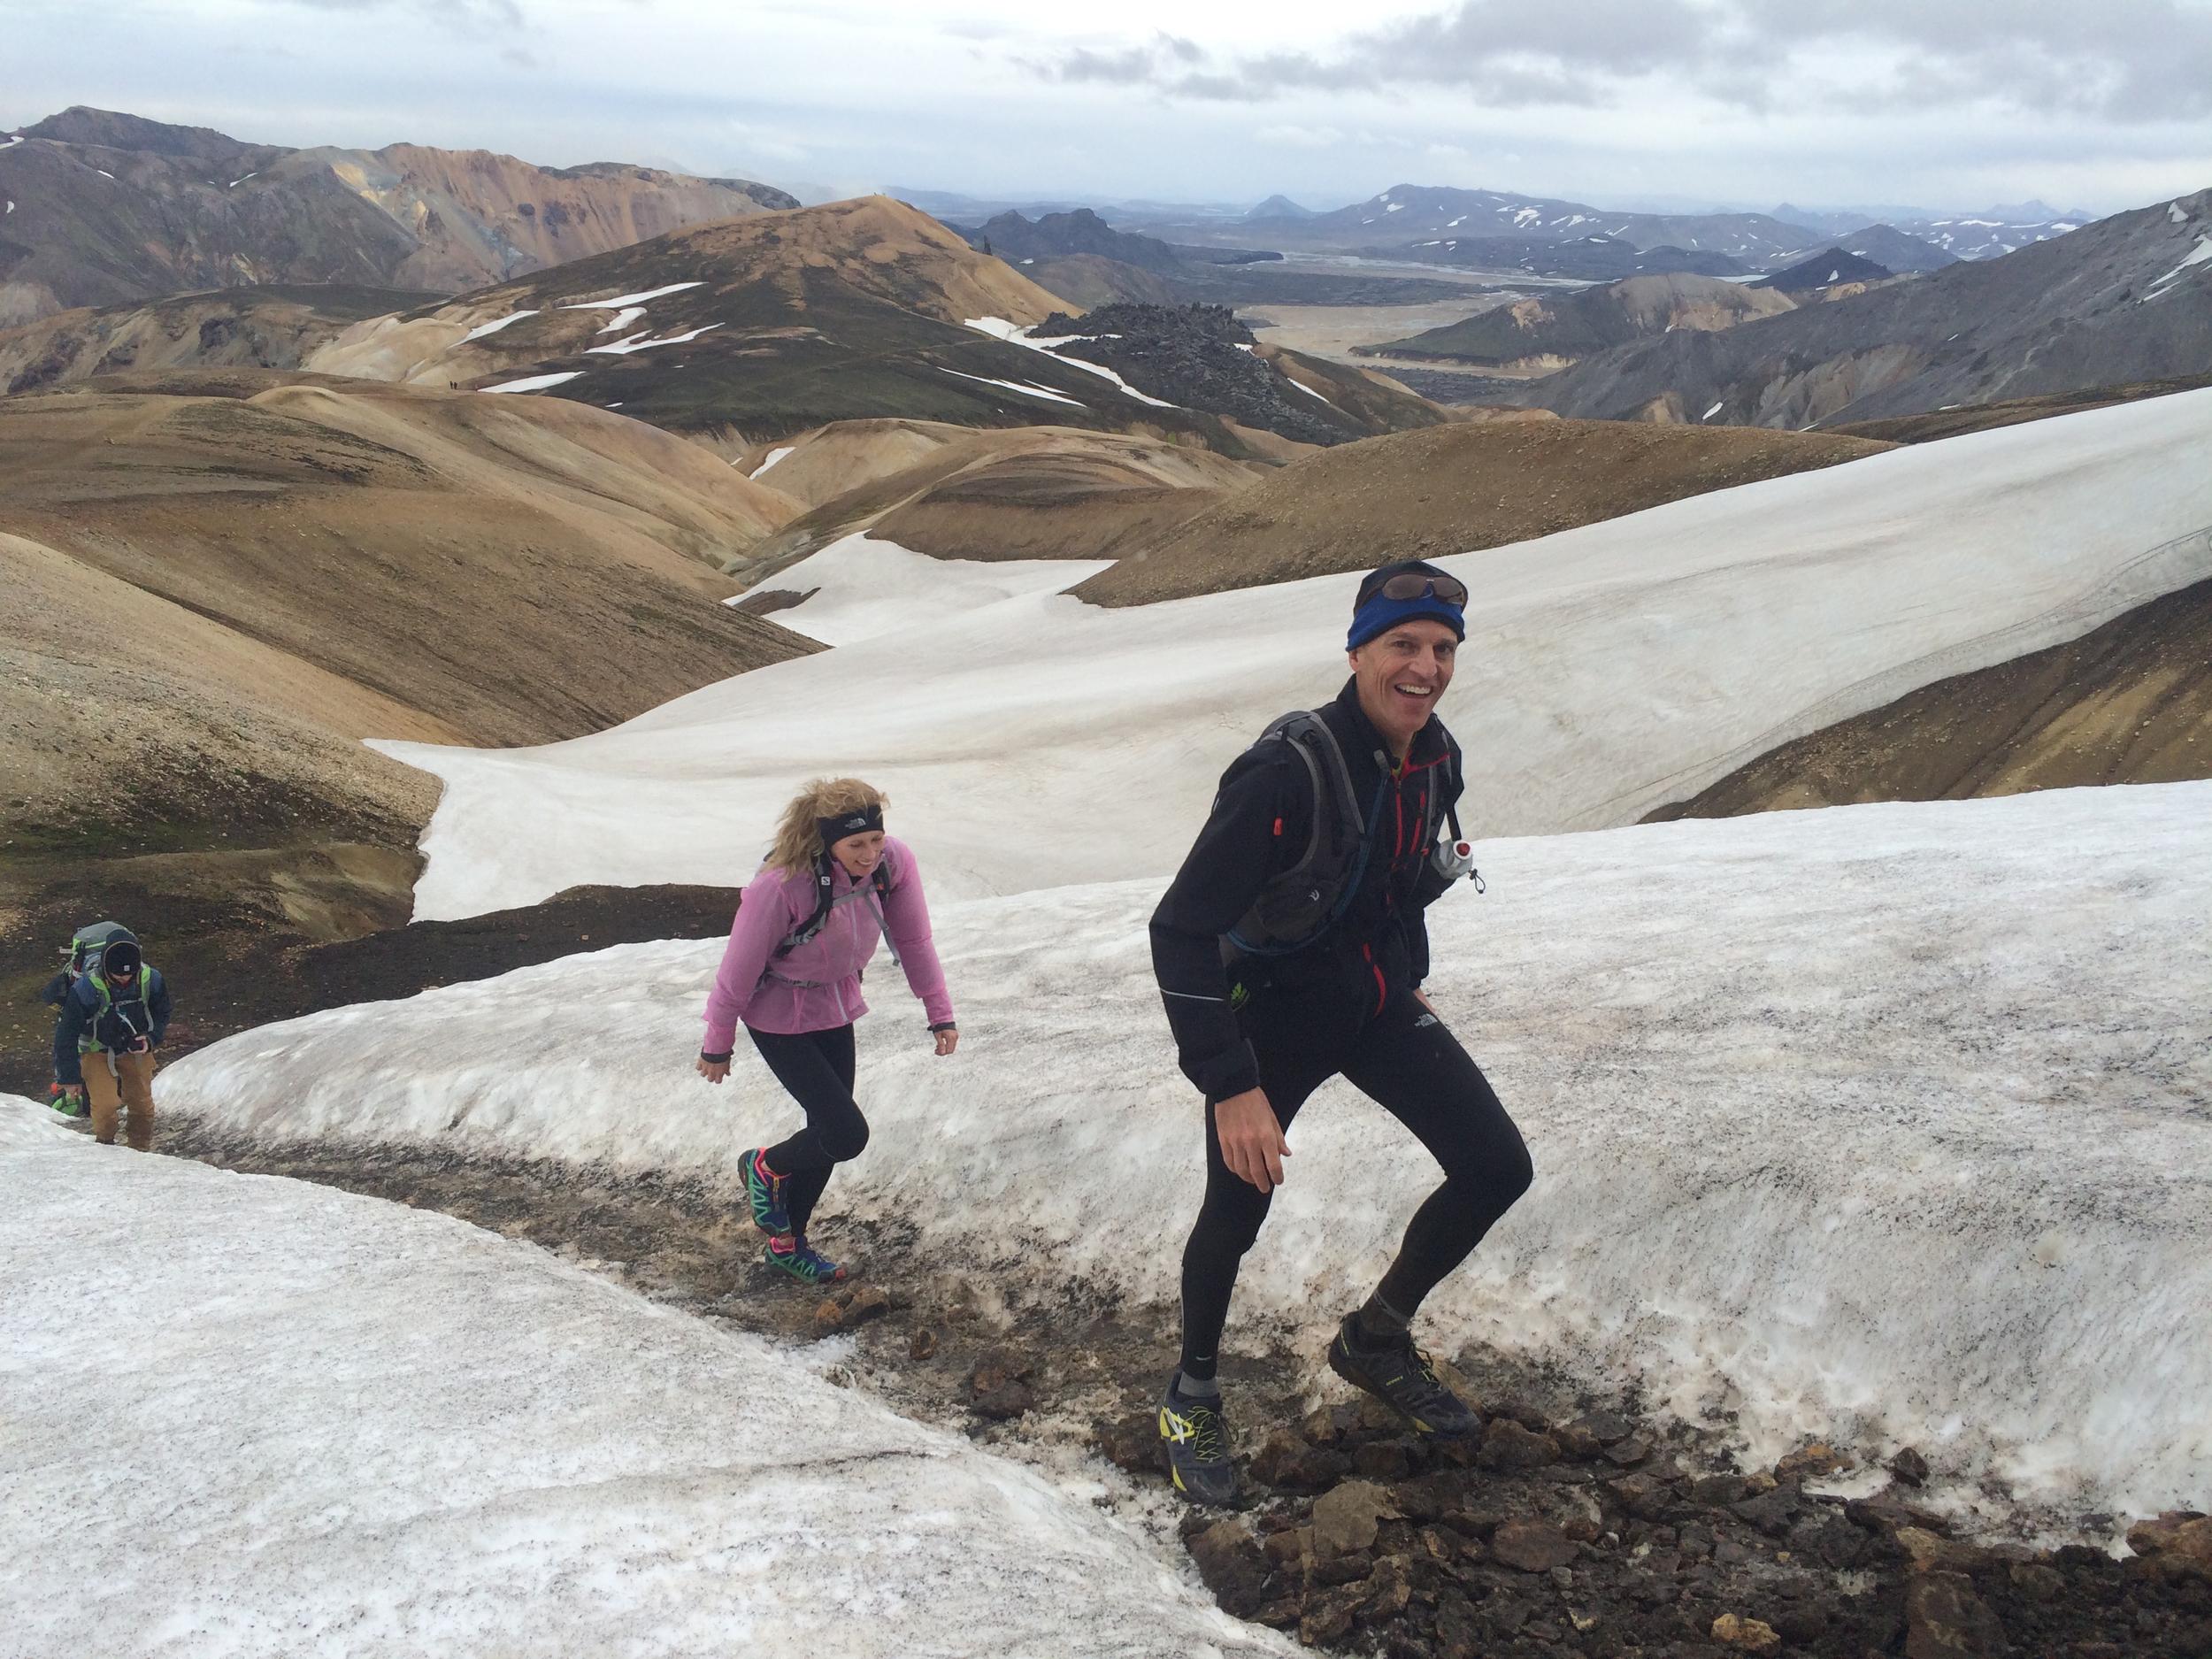 Walking upwards between snow shafts on Laugavegur